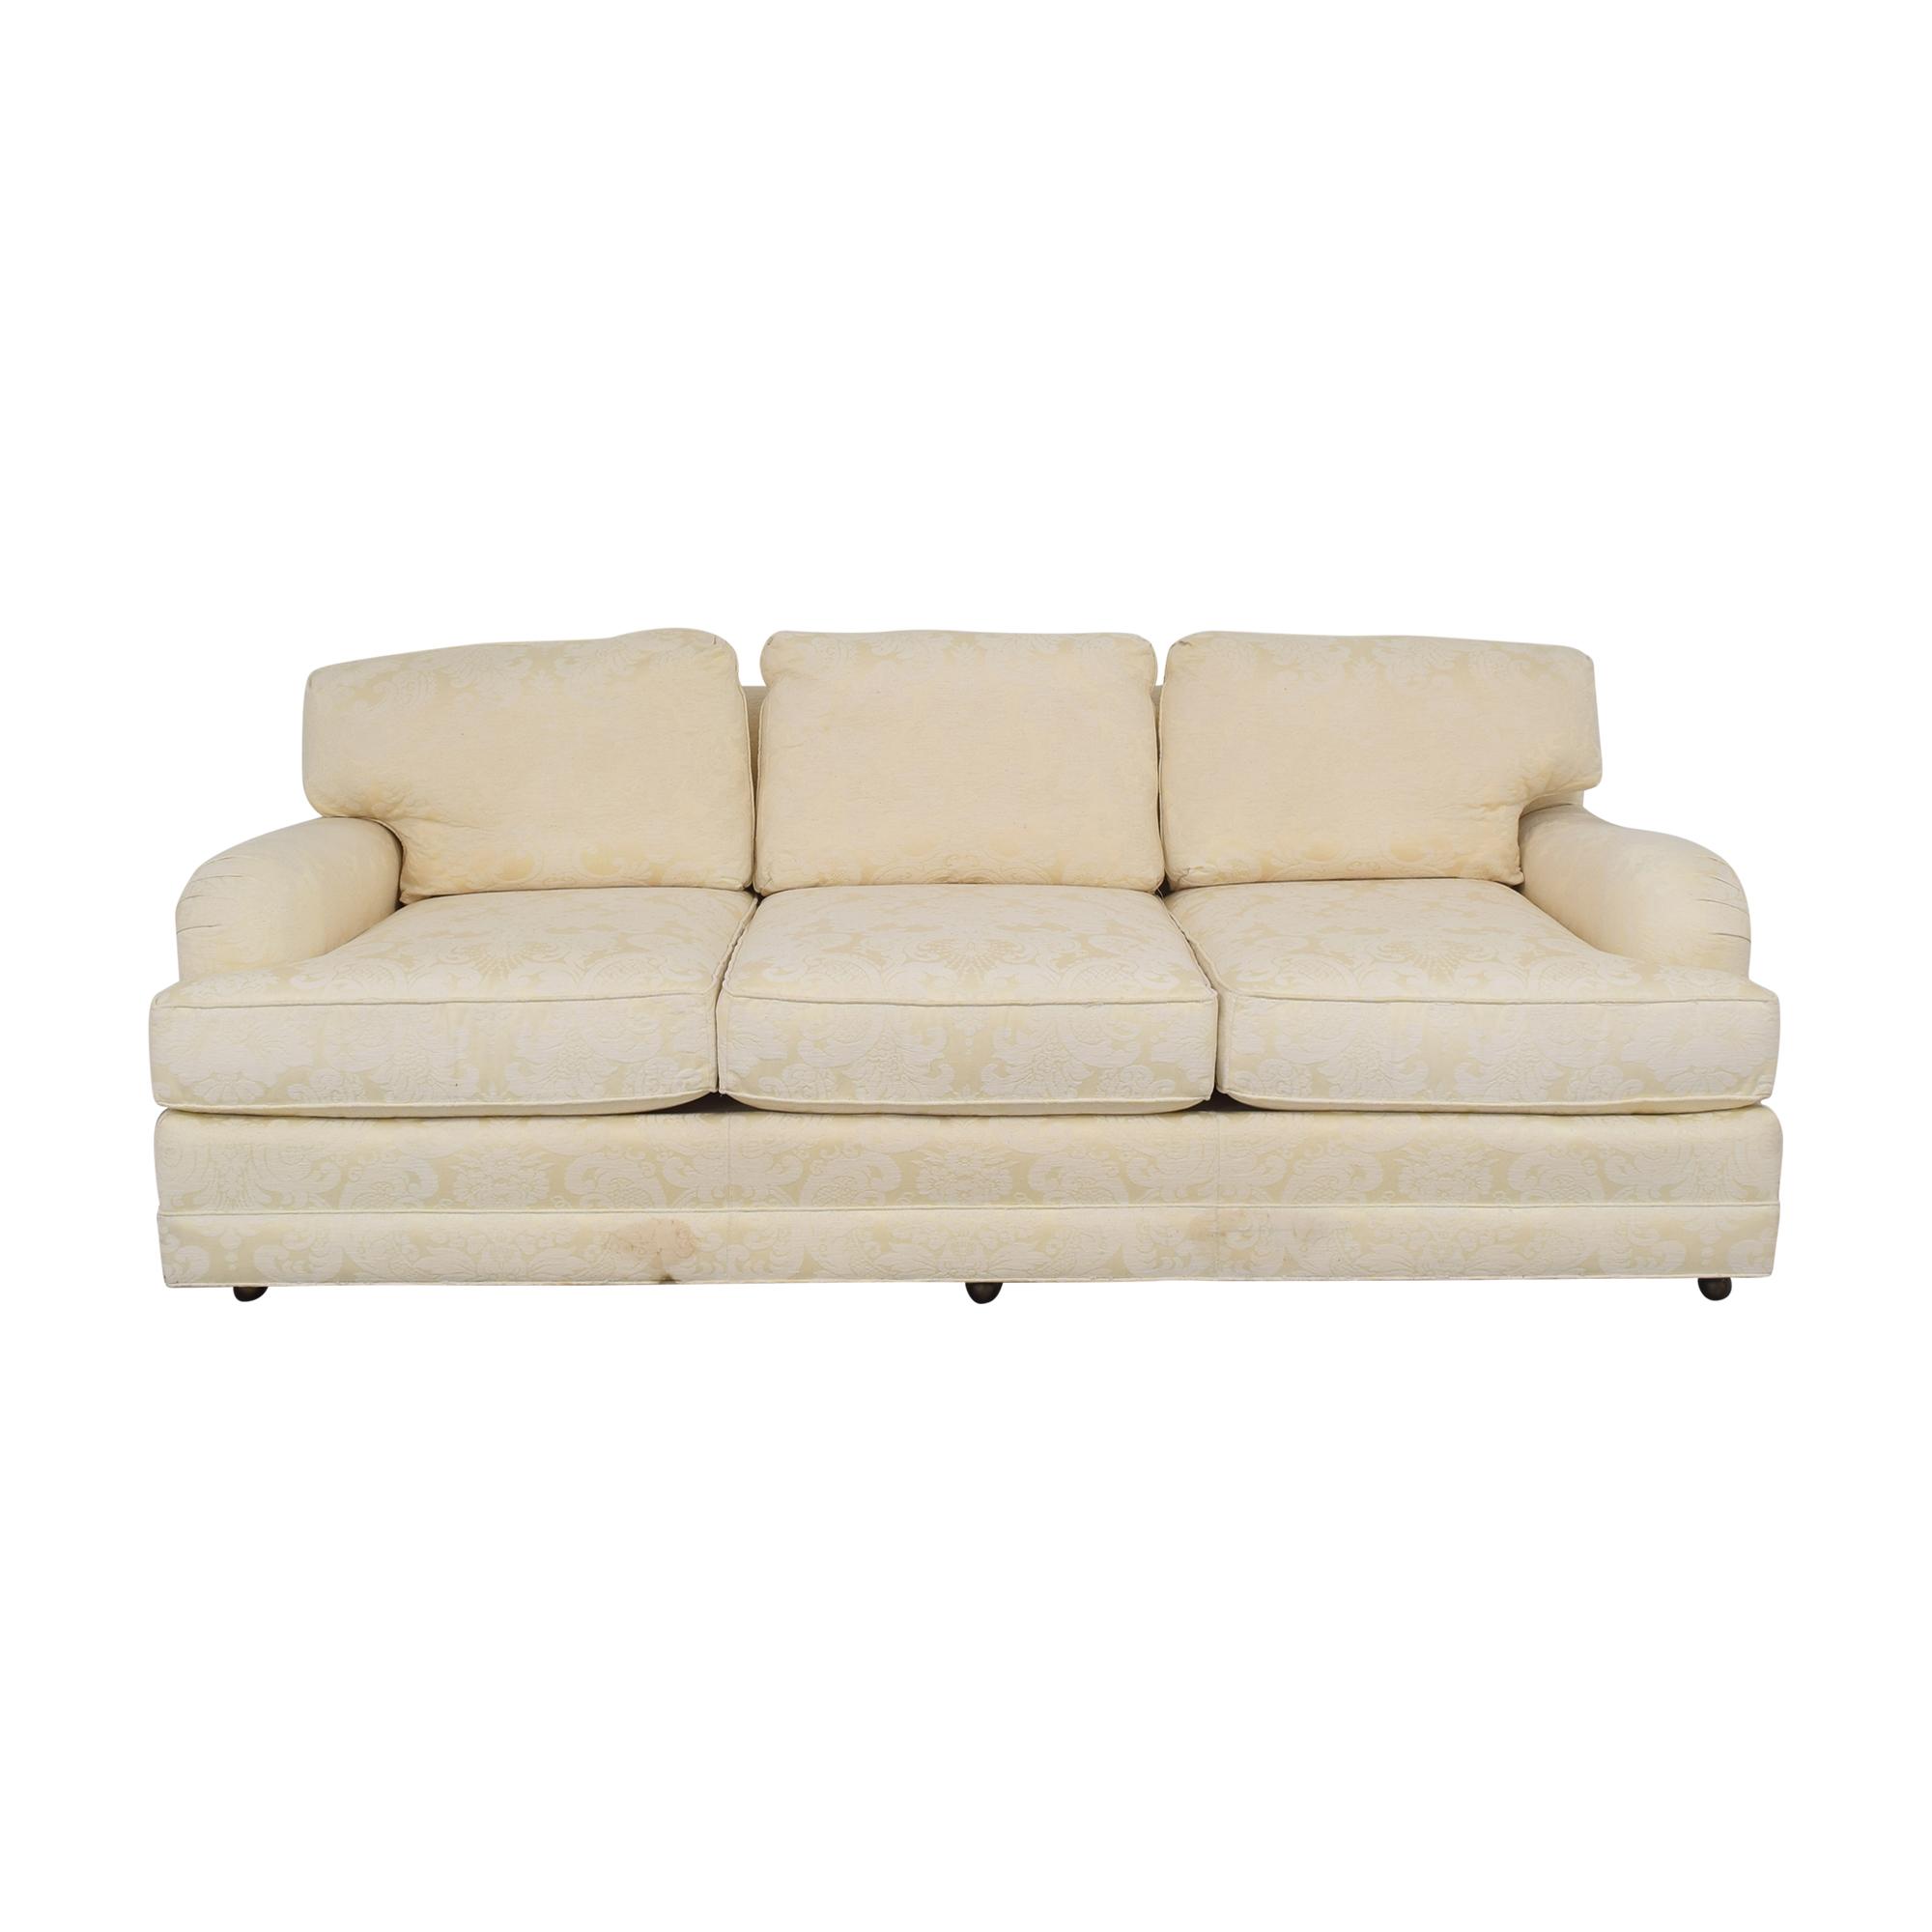 Henredon Furniture Henredon Damask Sofa used